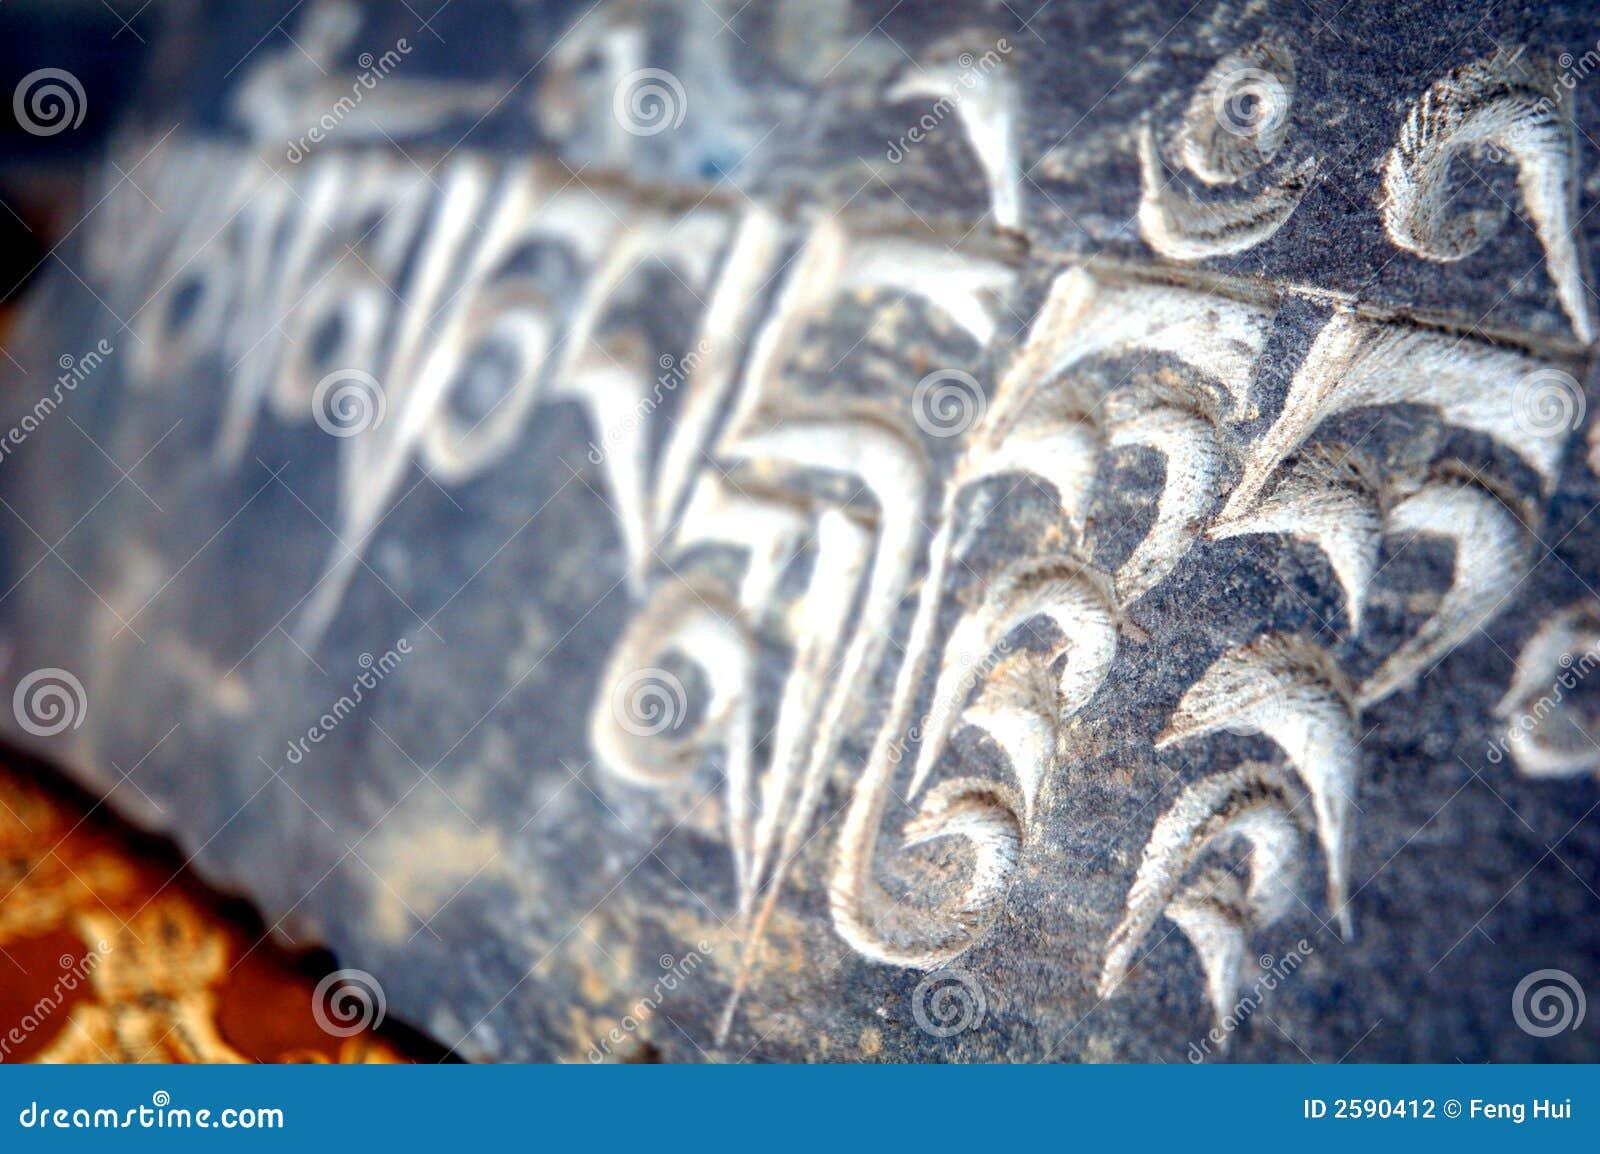 Tibetan sneed